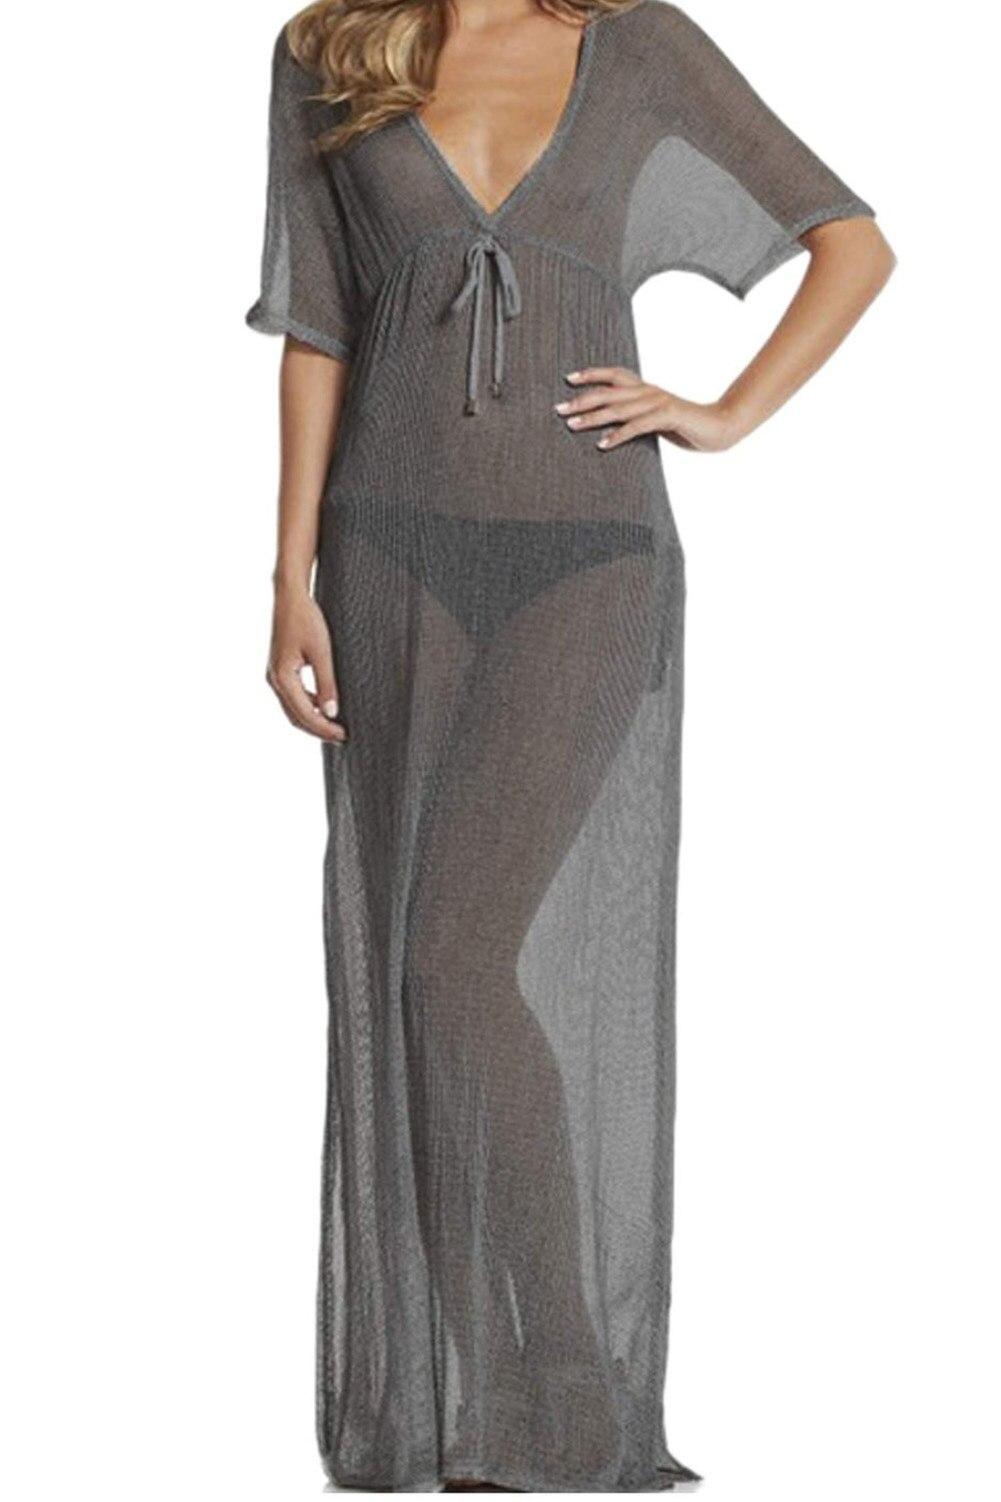 5pcs( Sexy Long Mesh Beach Dress Beach Bikini Swimwear Cover Up Grey<br>